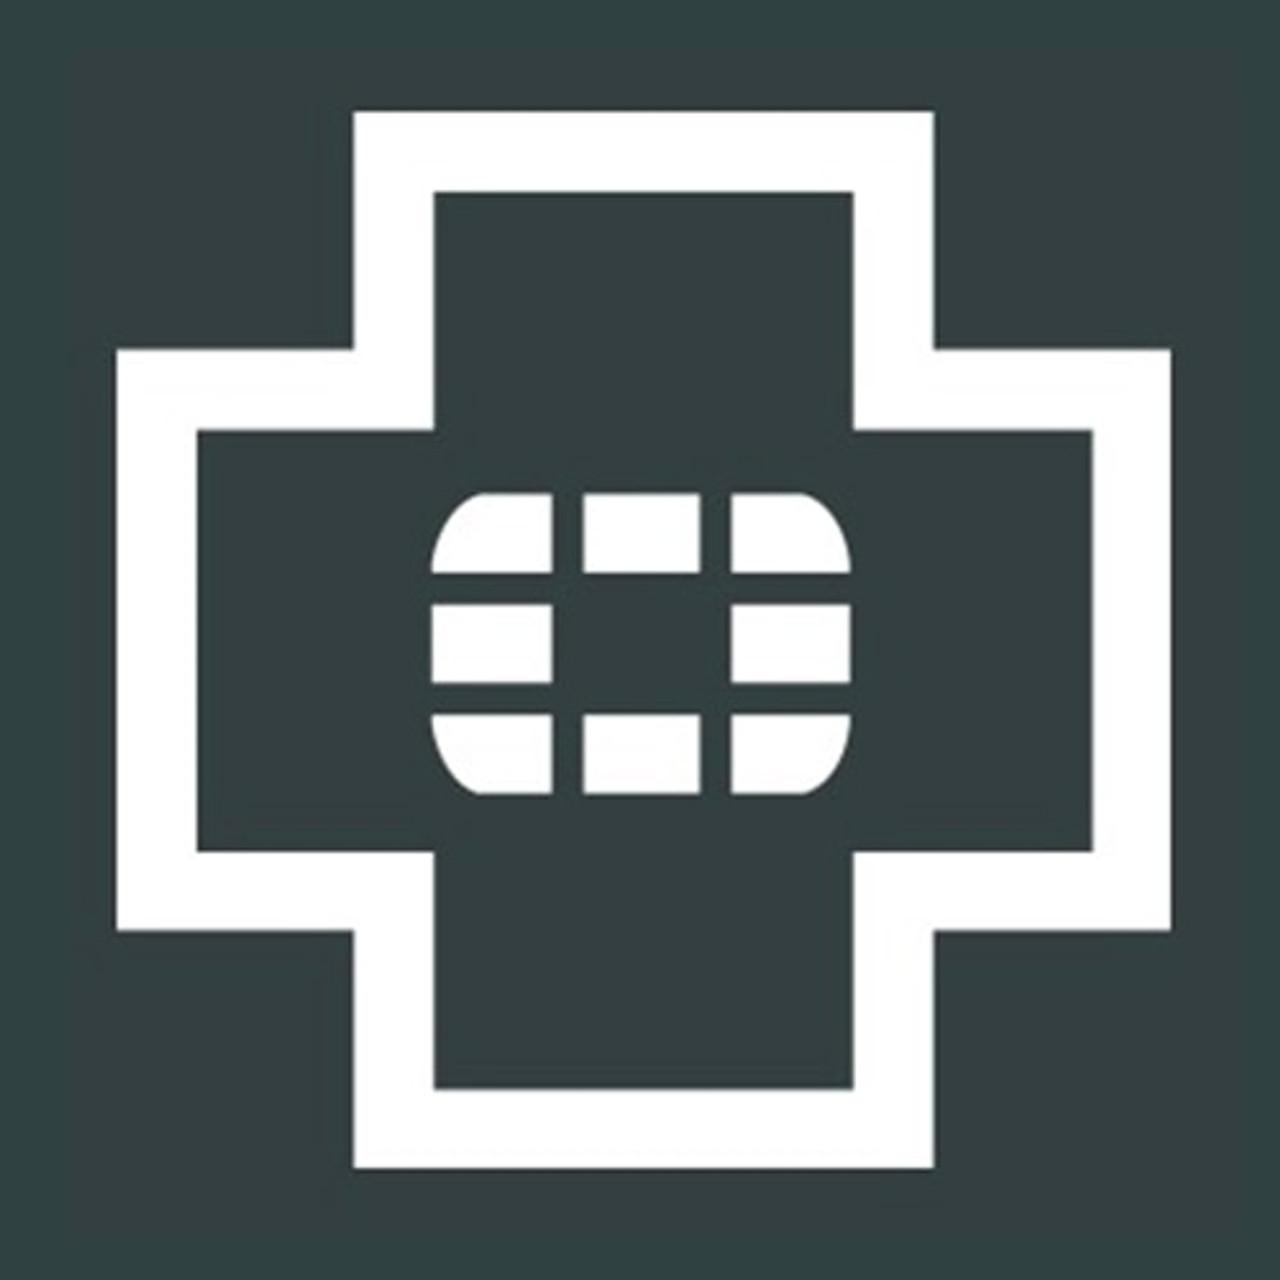 FortiGate-60E - 24x7 FortiCare Contract - 36 months